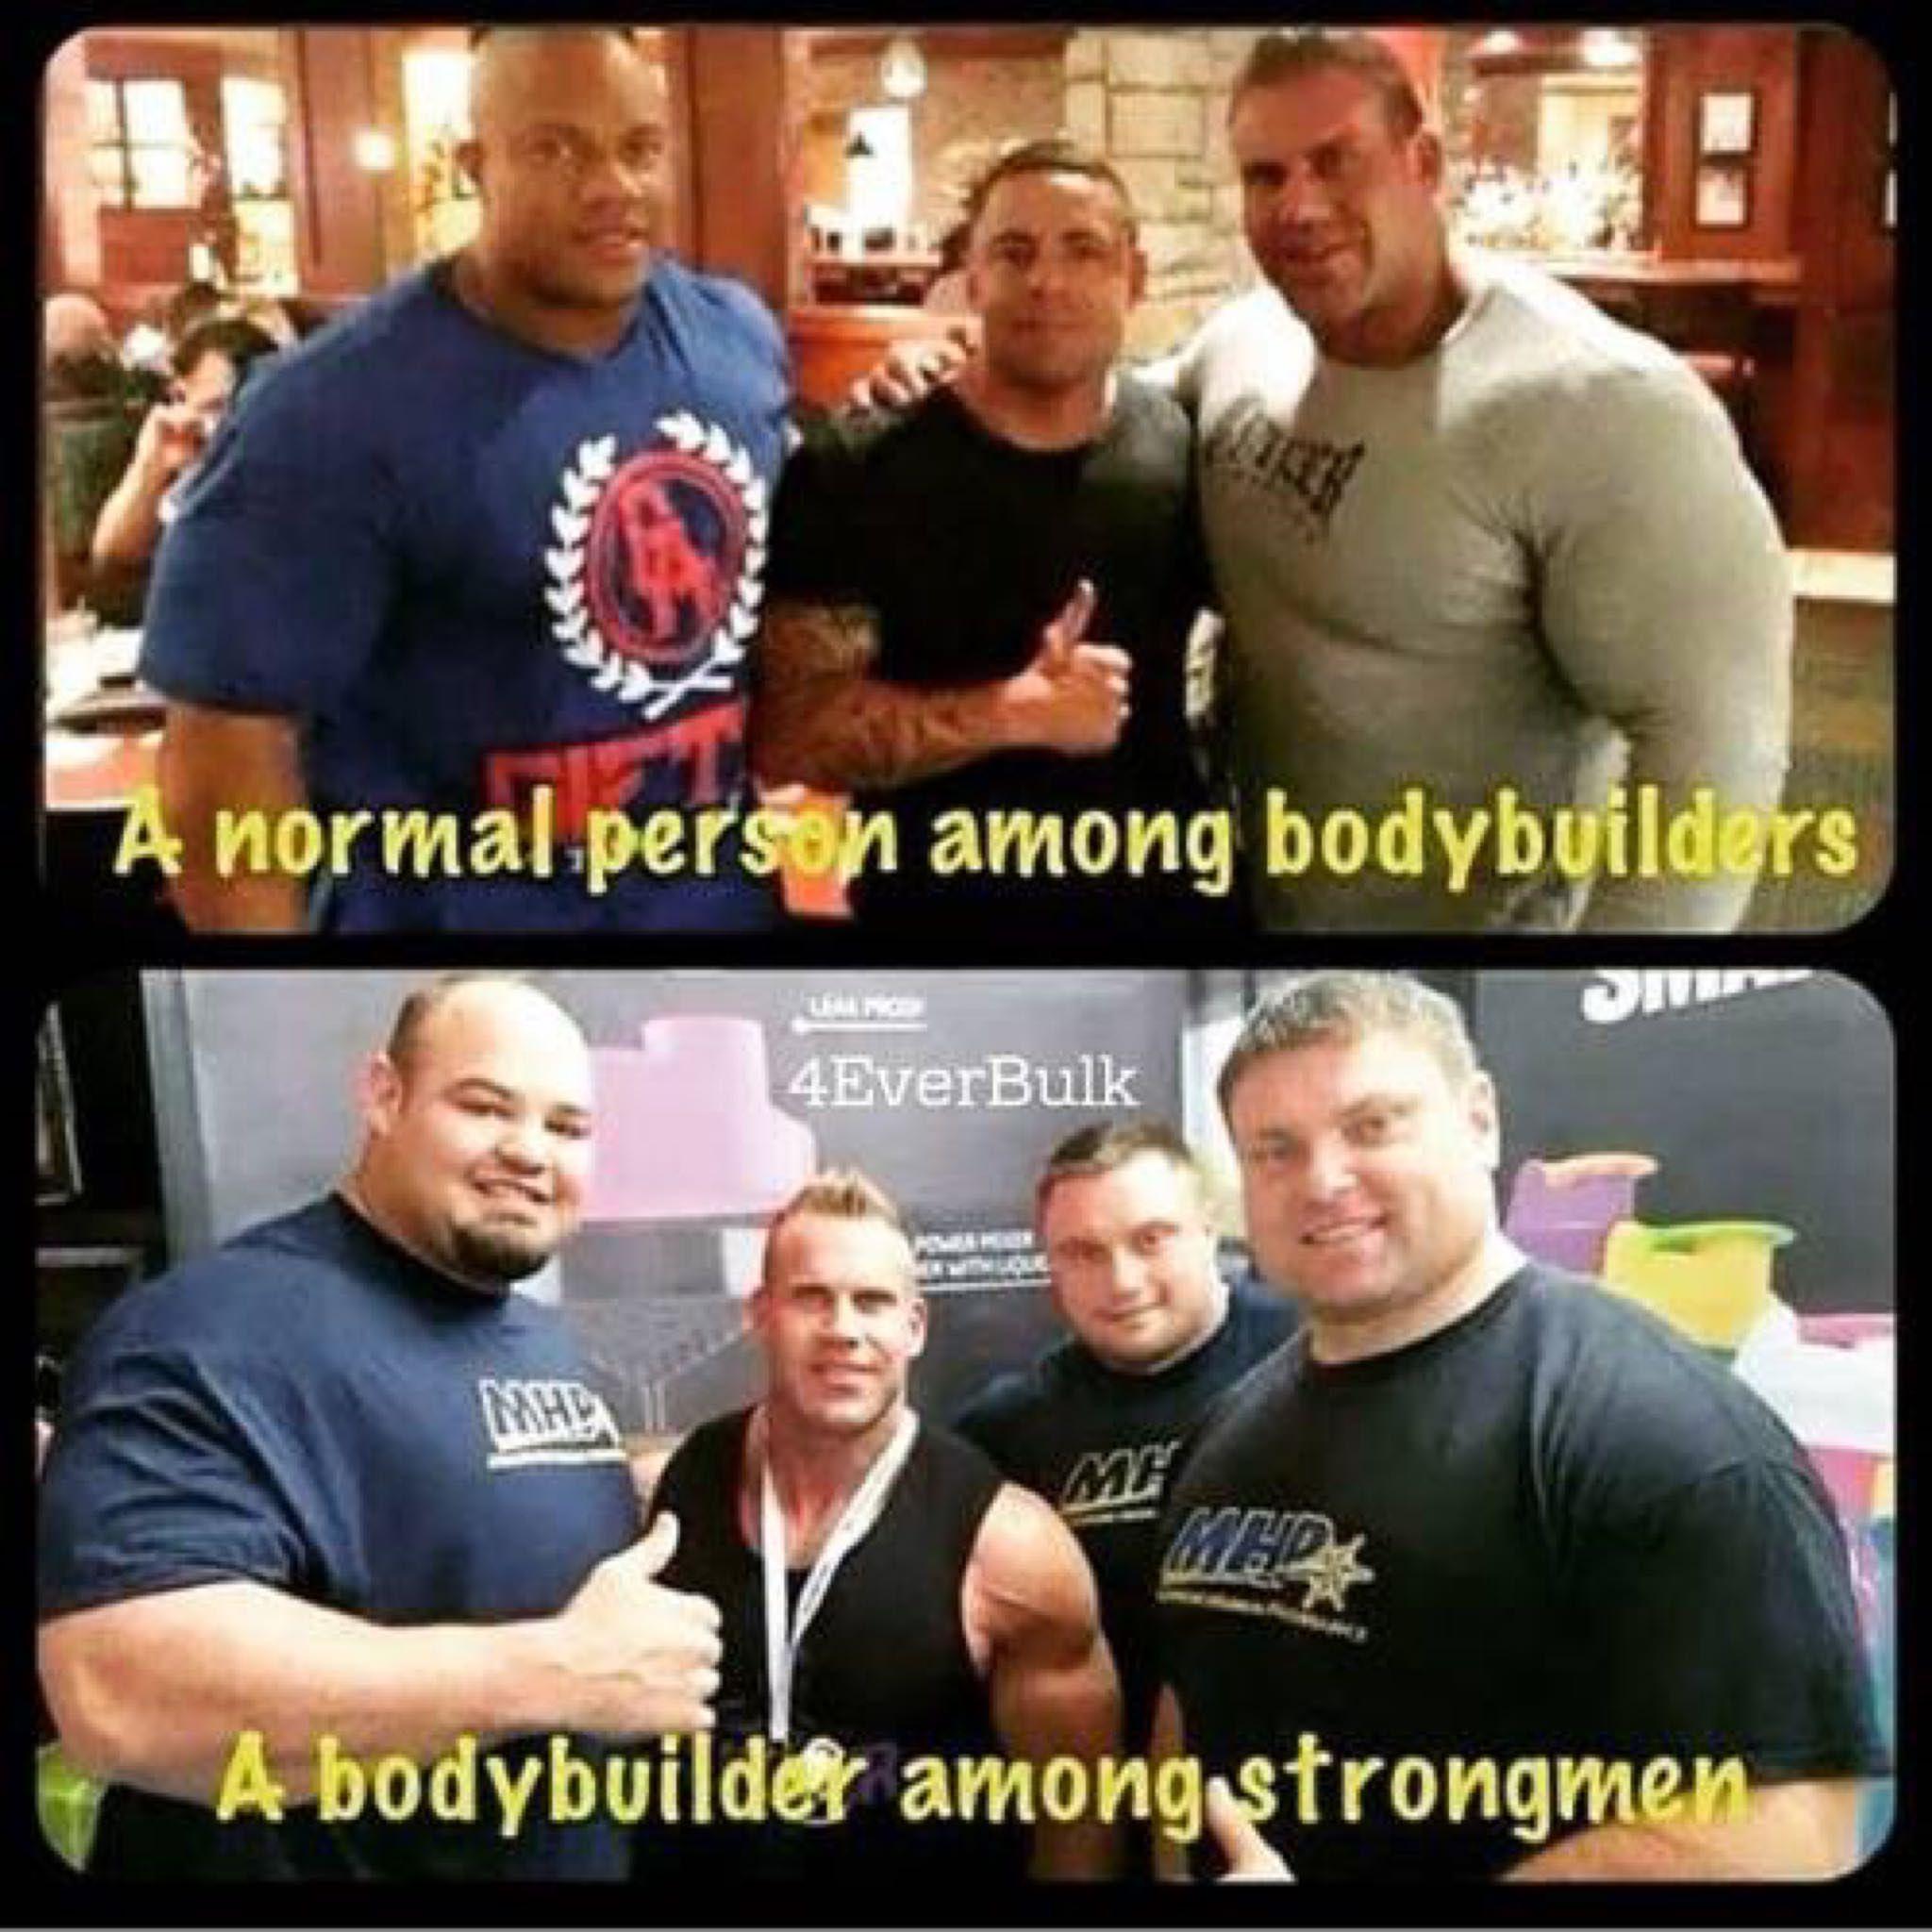 Lol bodybuilders